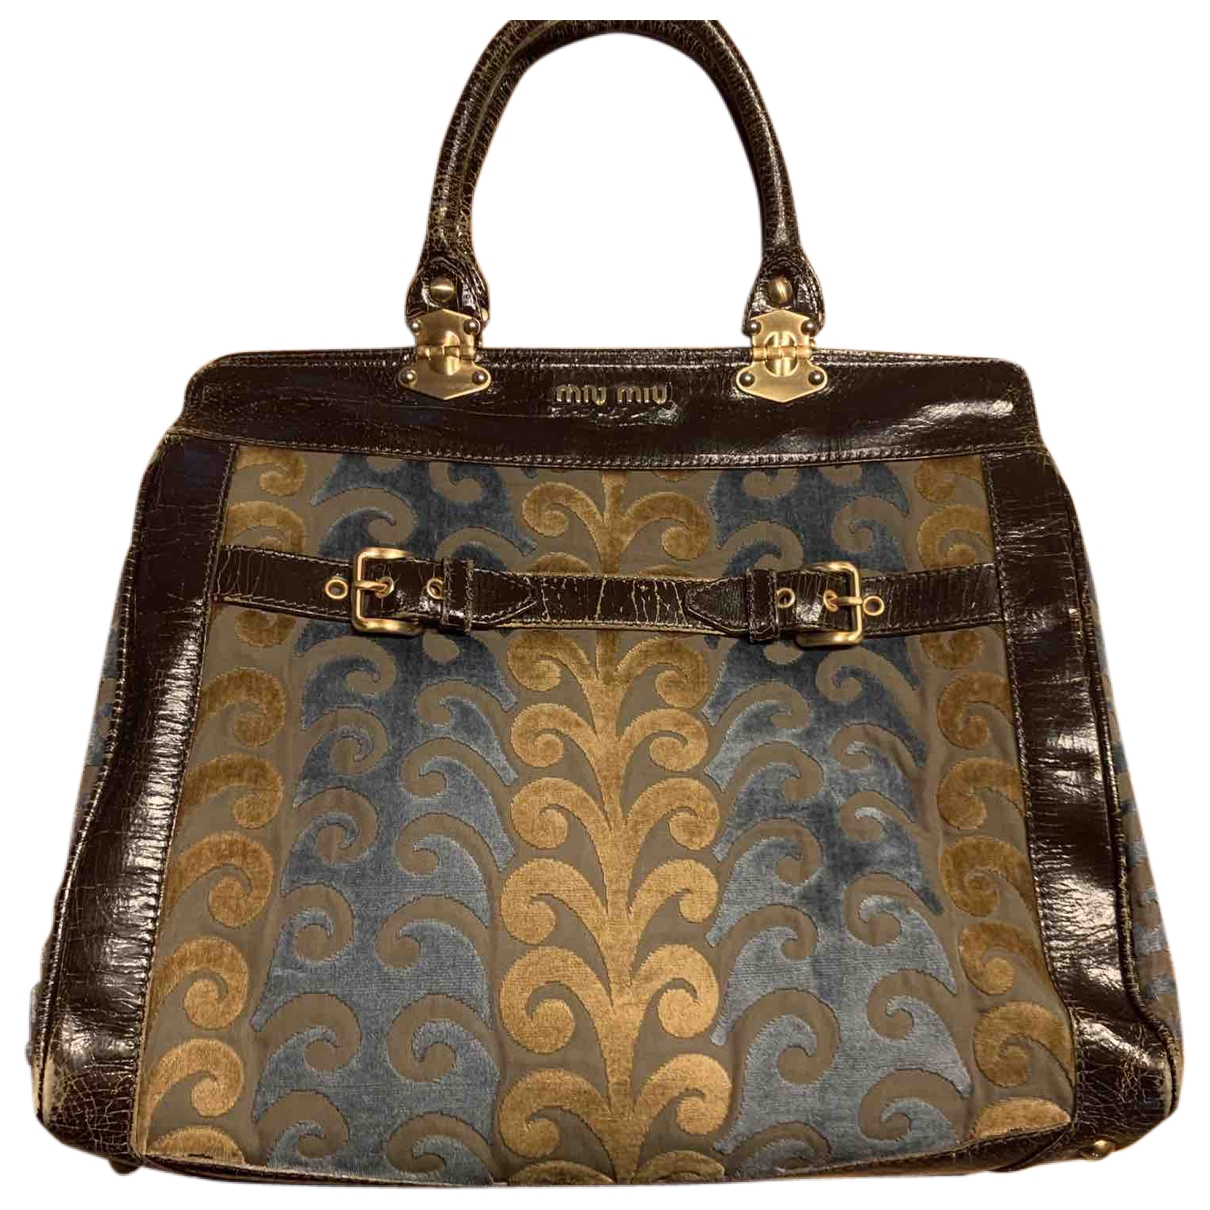 Miu Miu \N Handtasche in Leinen